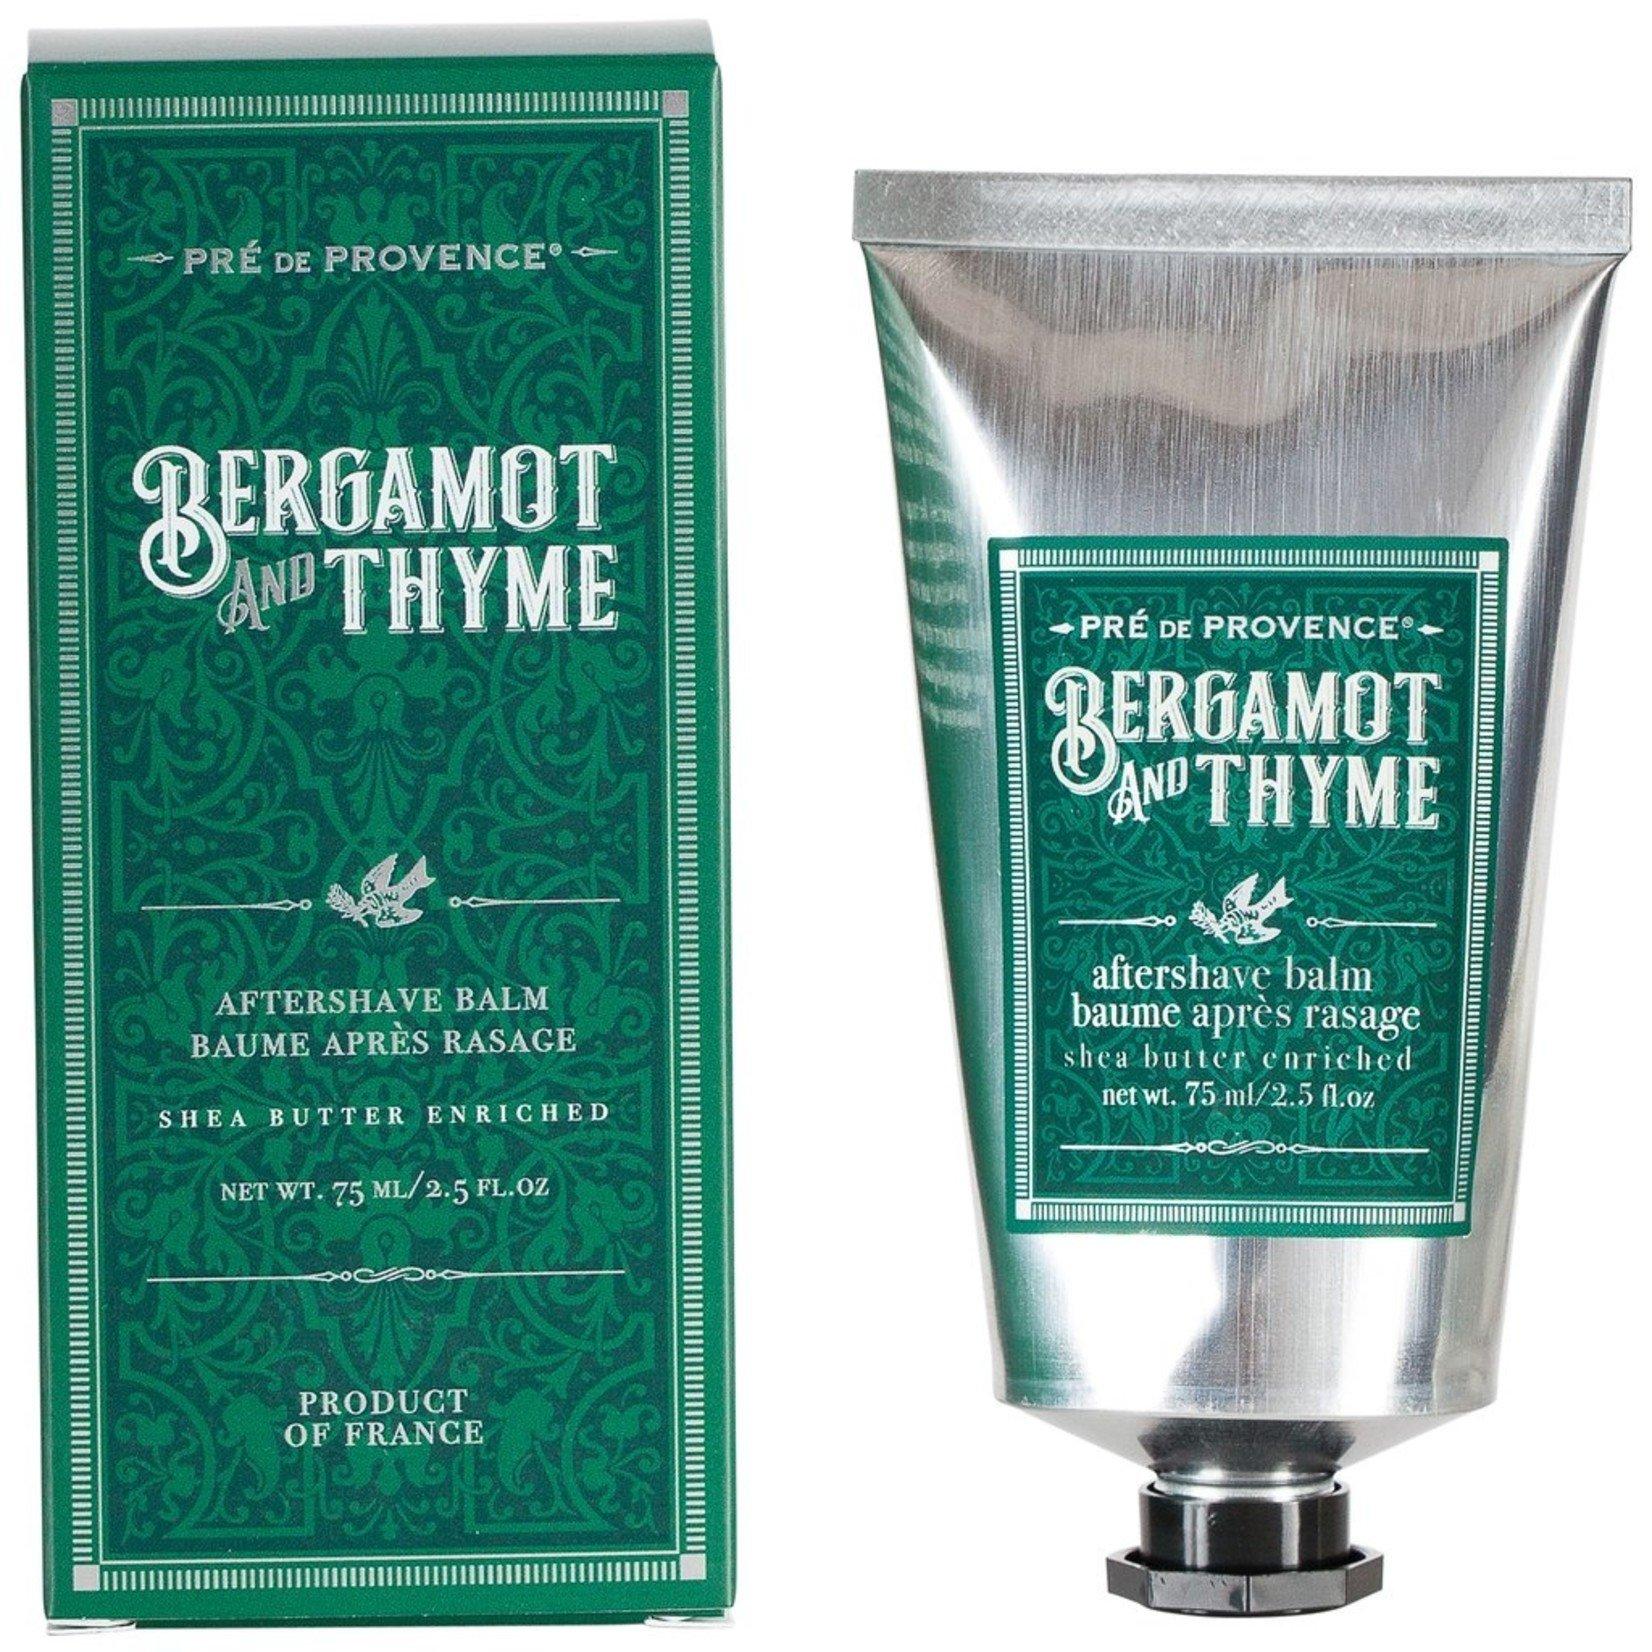 Pre de Provence Bergamot & Thyme Shea Butter After-Shave Balm